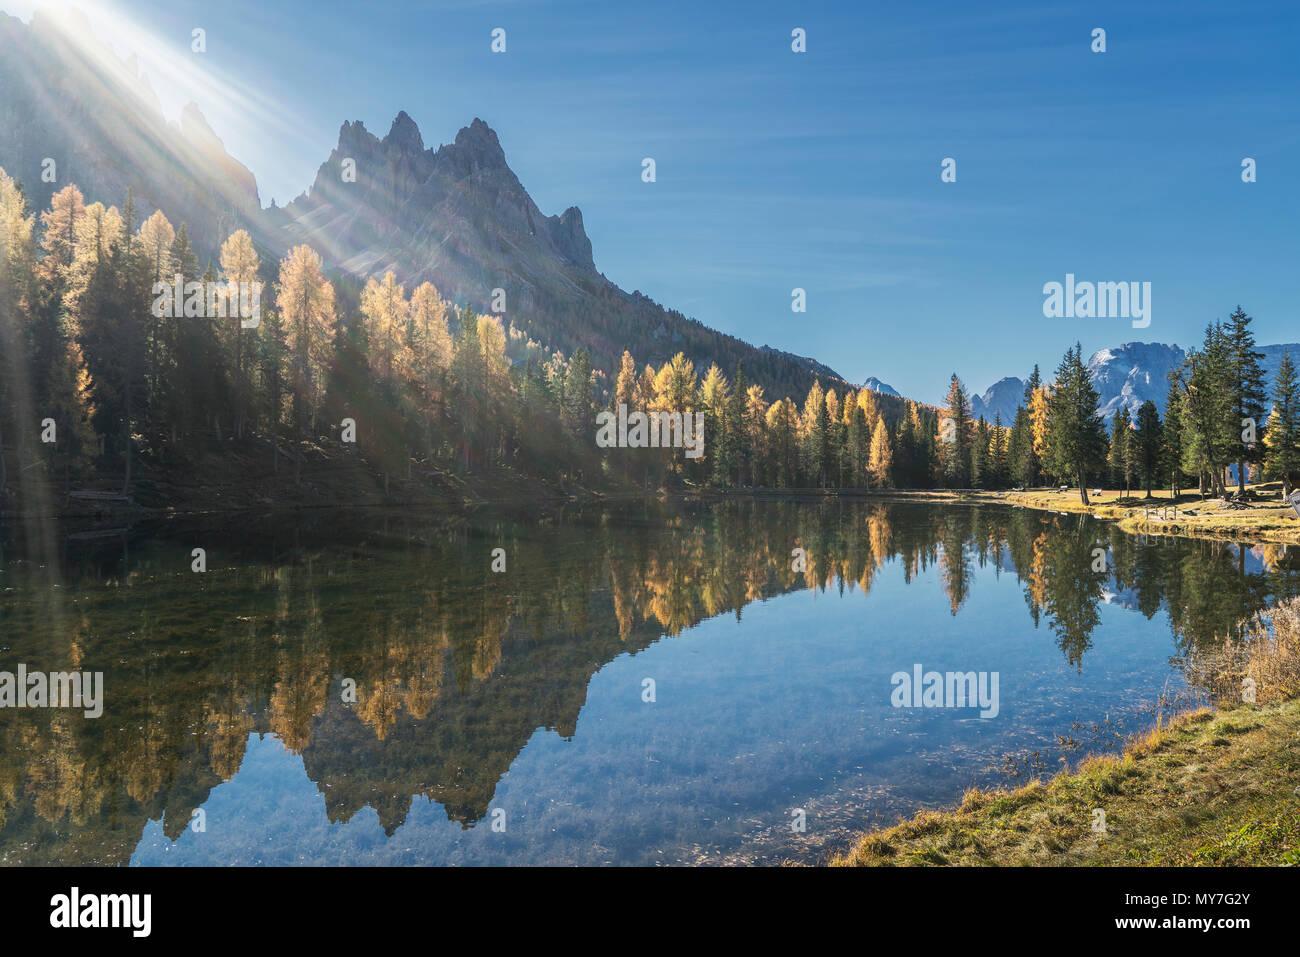 Sun over lake, Dolomites, Cortina d'Ampezzo, Veneto, Italy - Stock Image